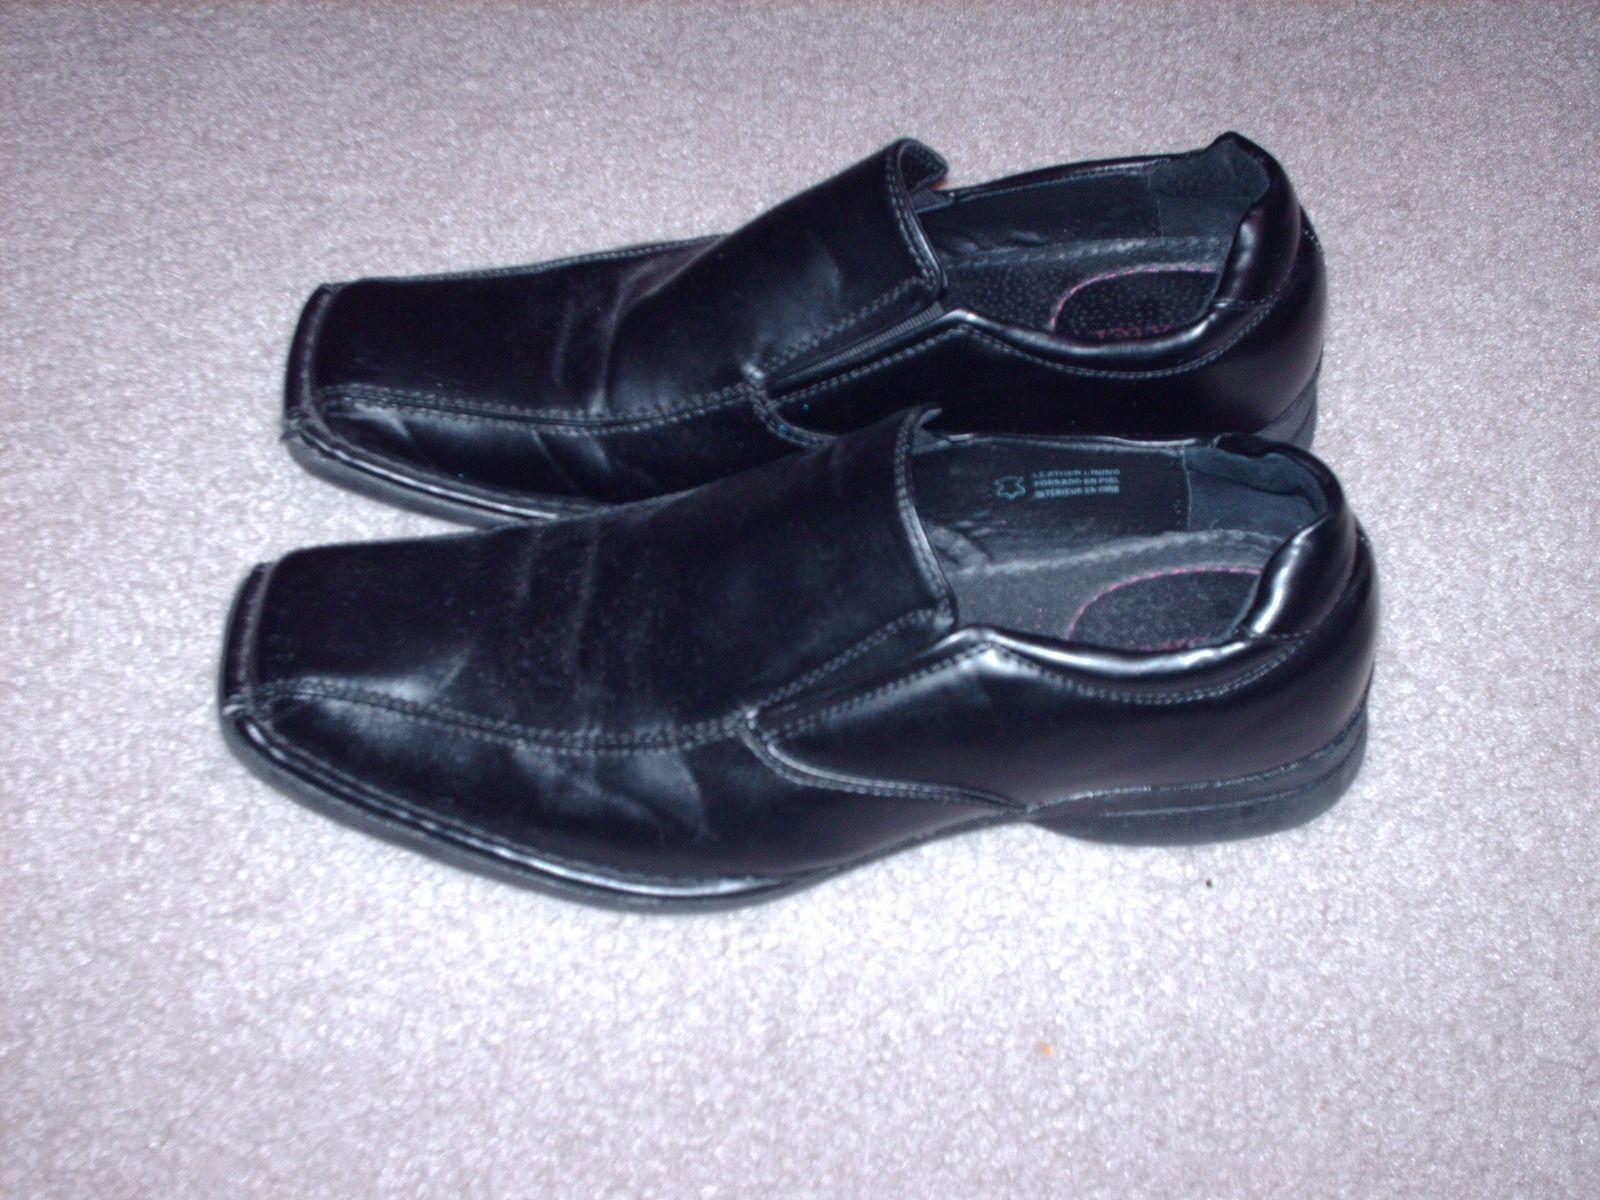 8acac9908c2a9 Men s Dress Shoes Dexter Black Leather Slip and 49 similar items. S l1600